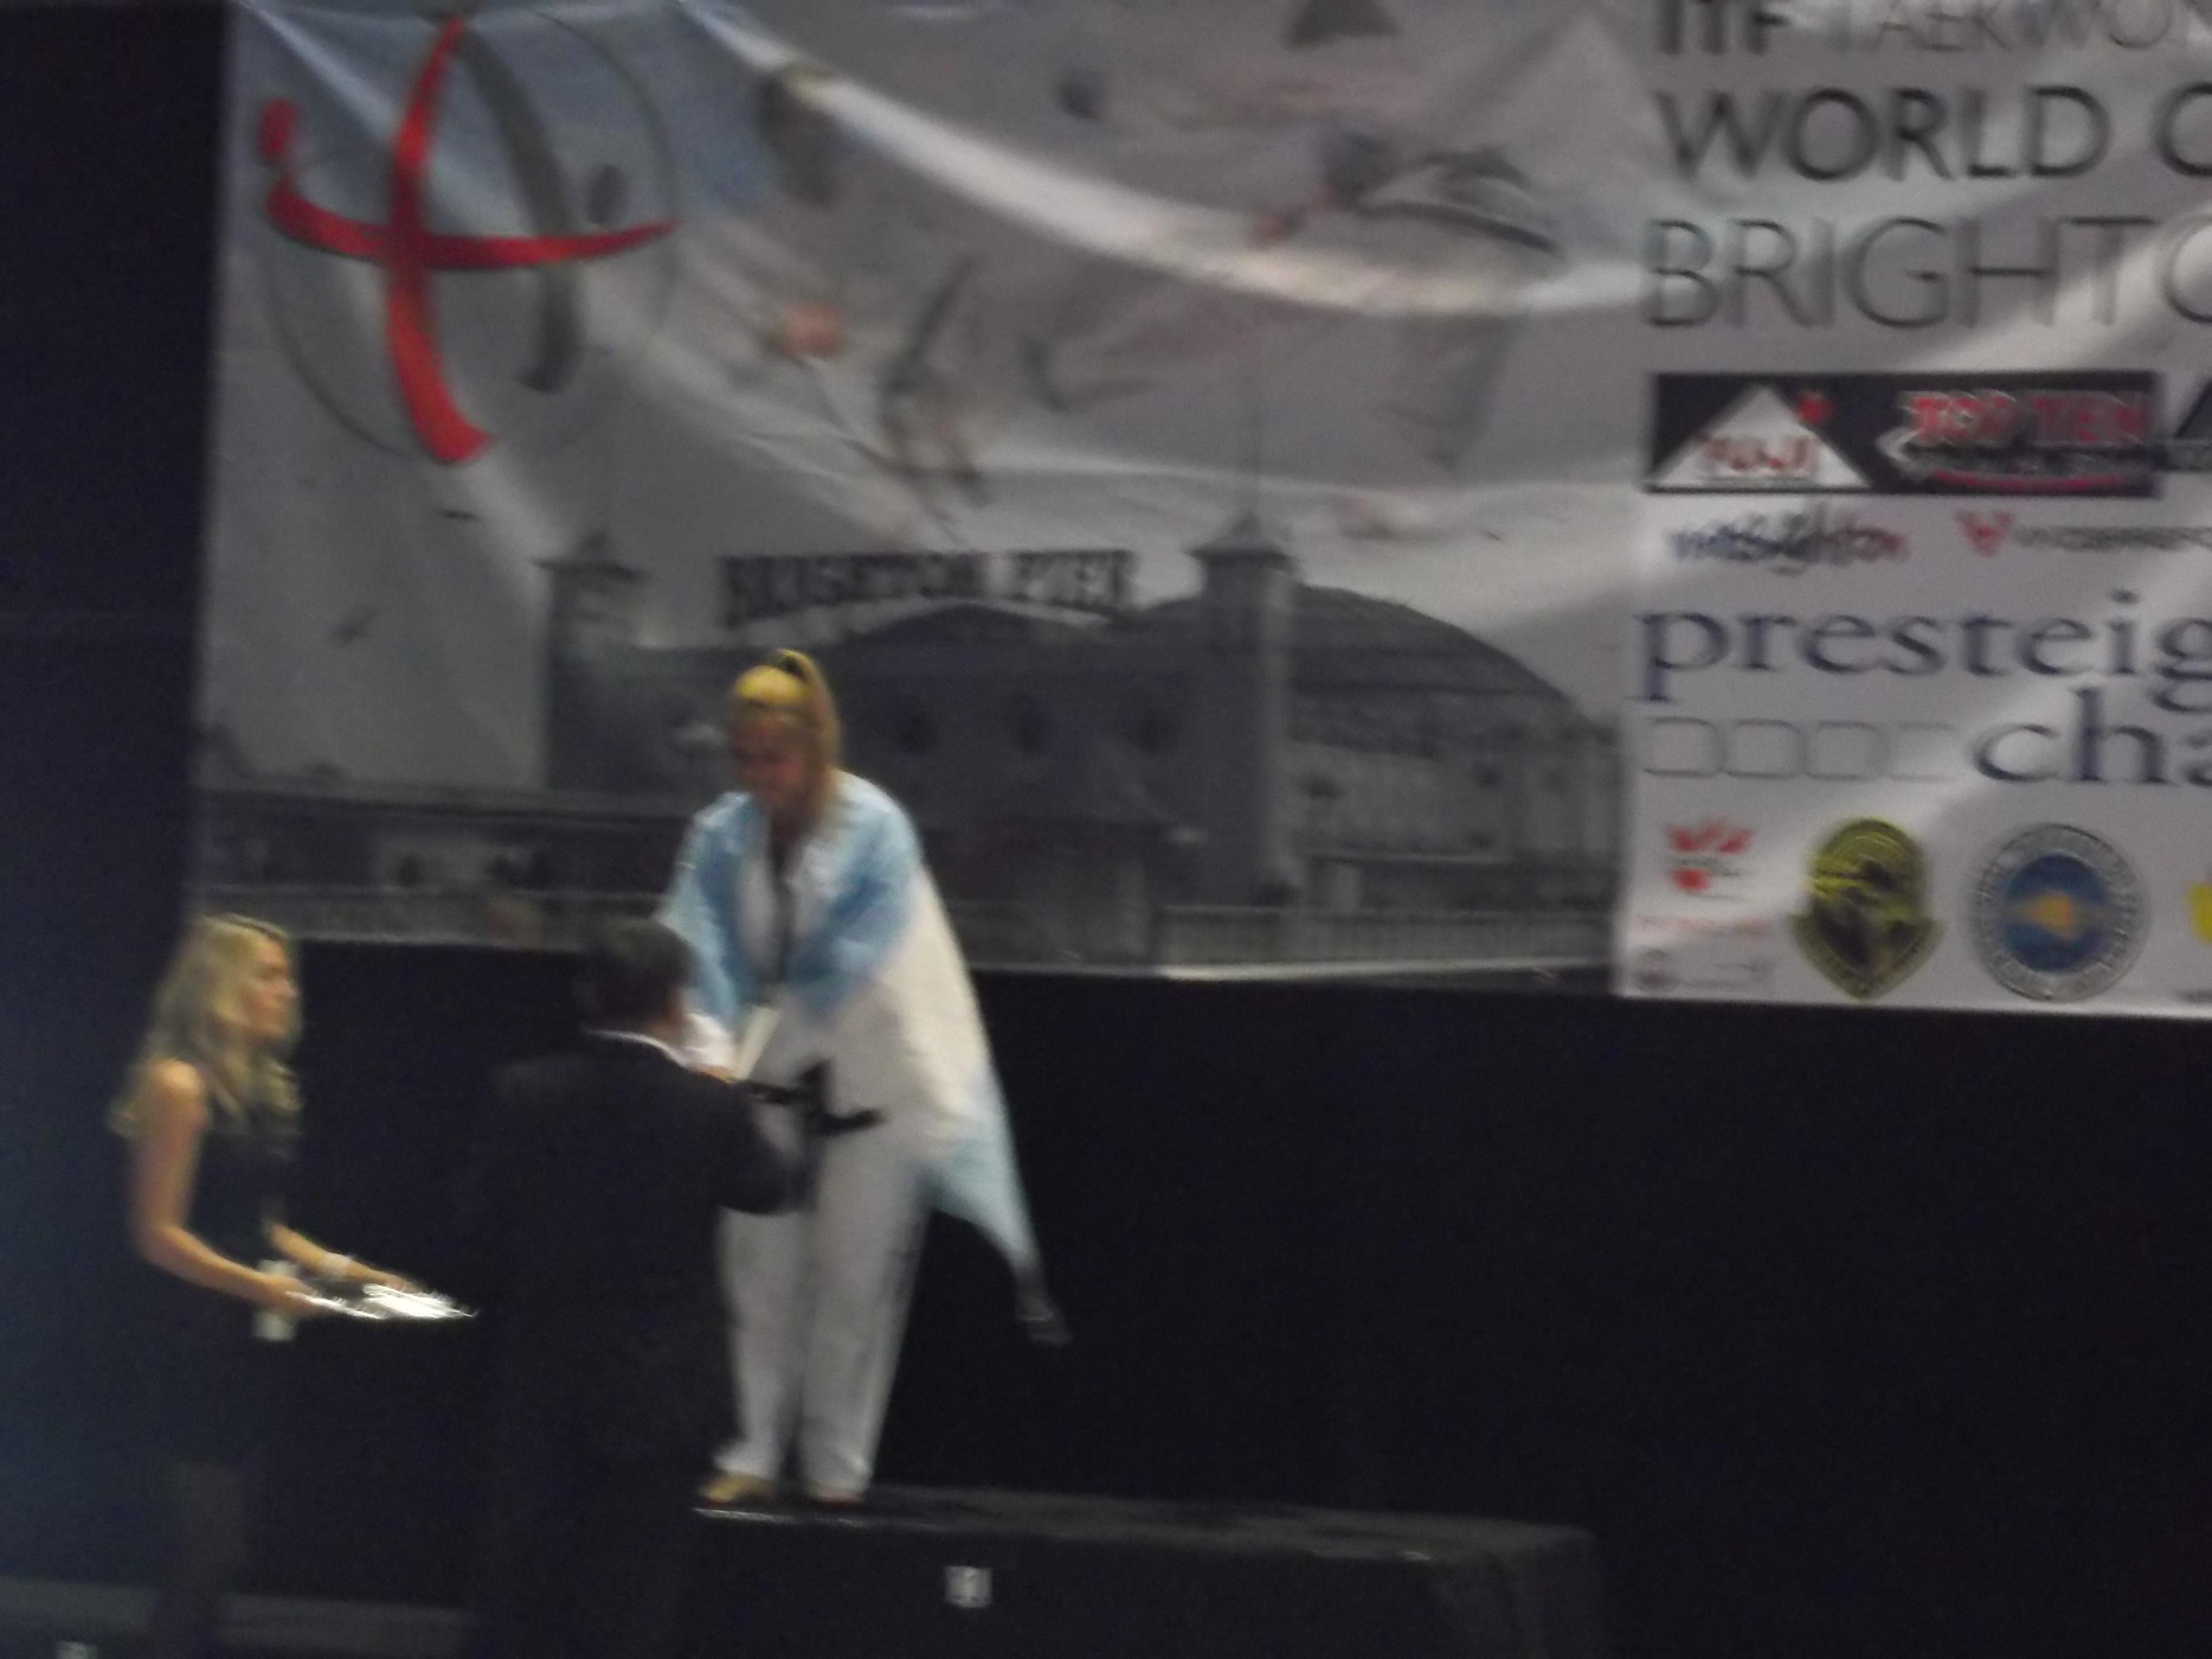 Graciela Van Risjwijk en el podio